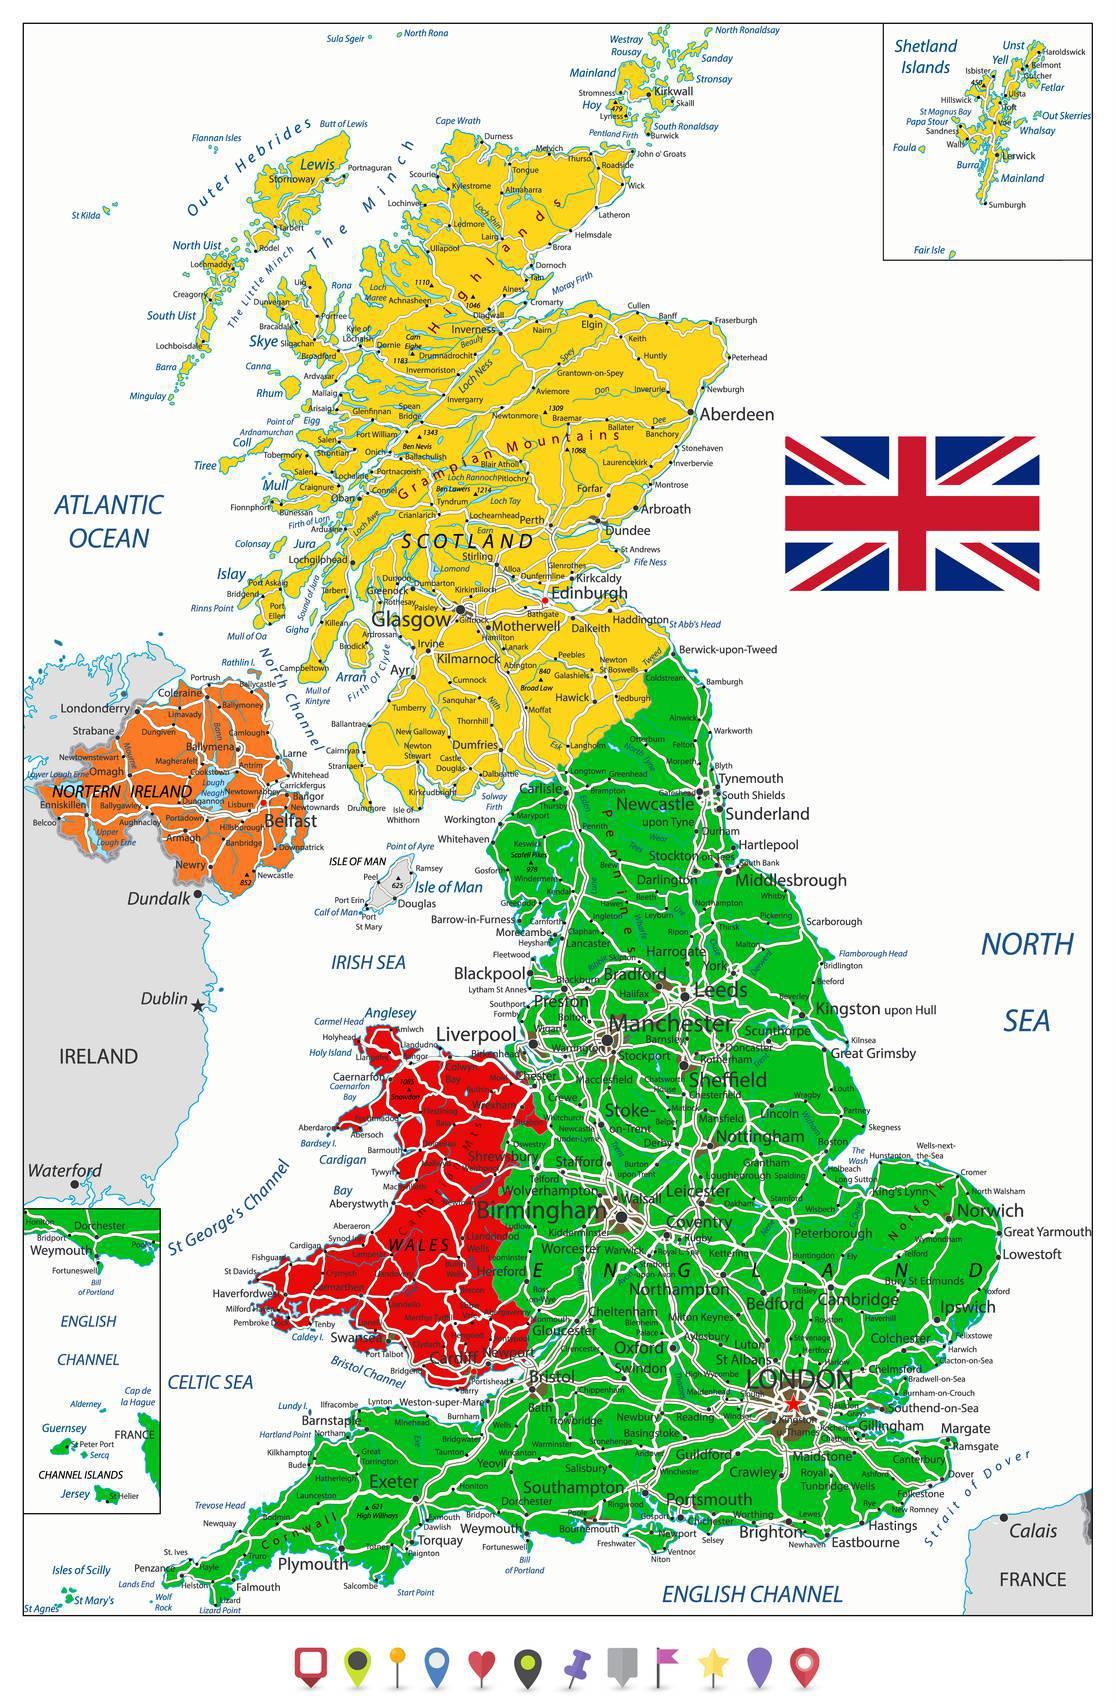 Carte De Langleterre Vierge.Carte De L Angleterre Plusieurs Cartes Du Pays Constitutif